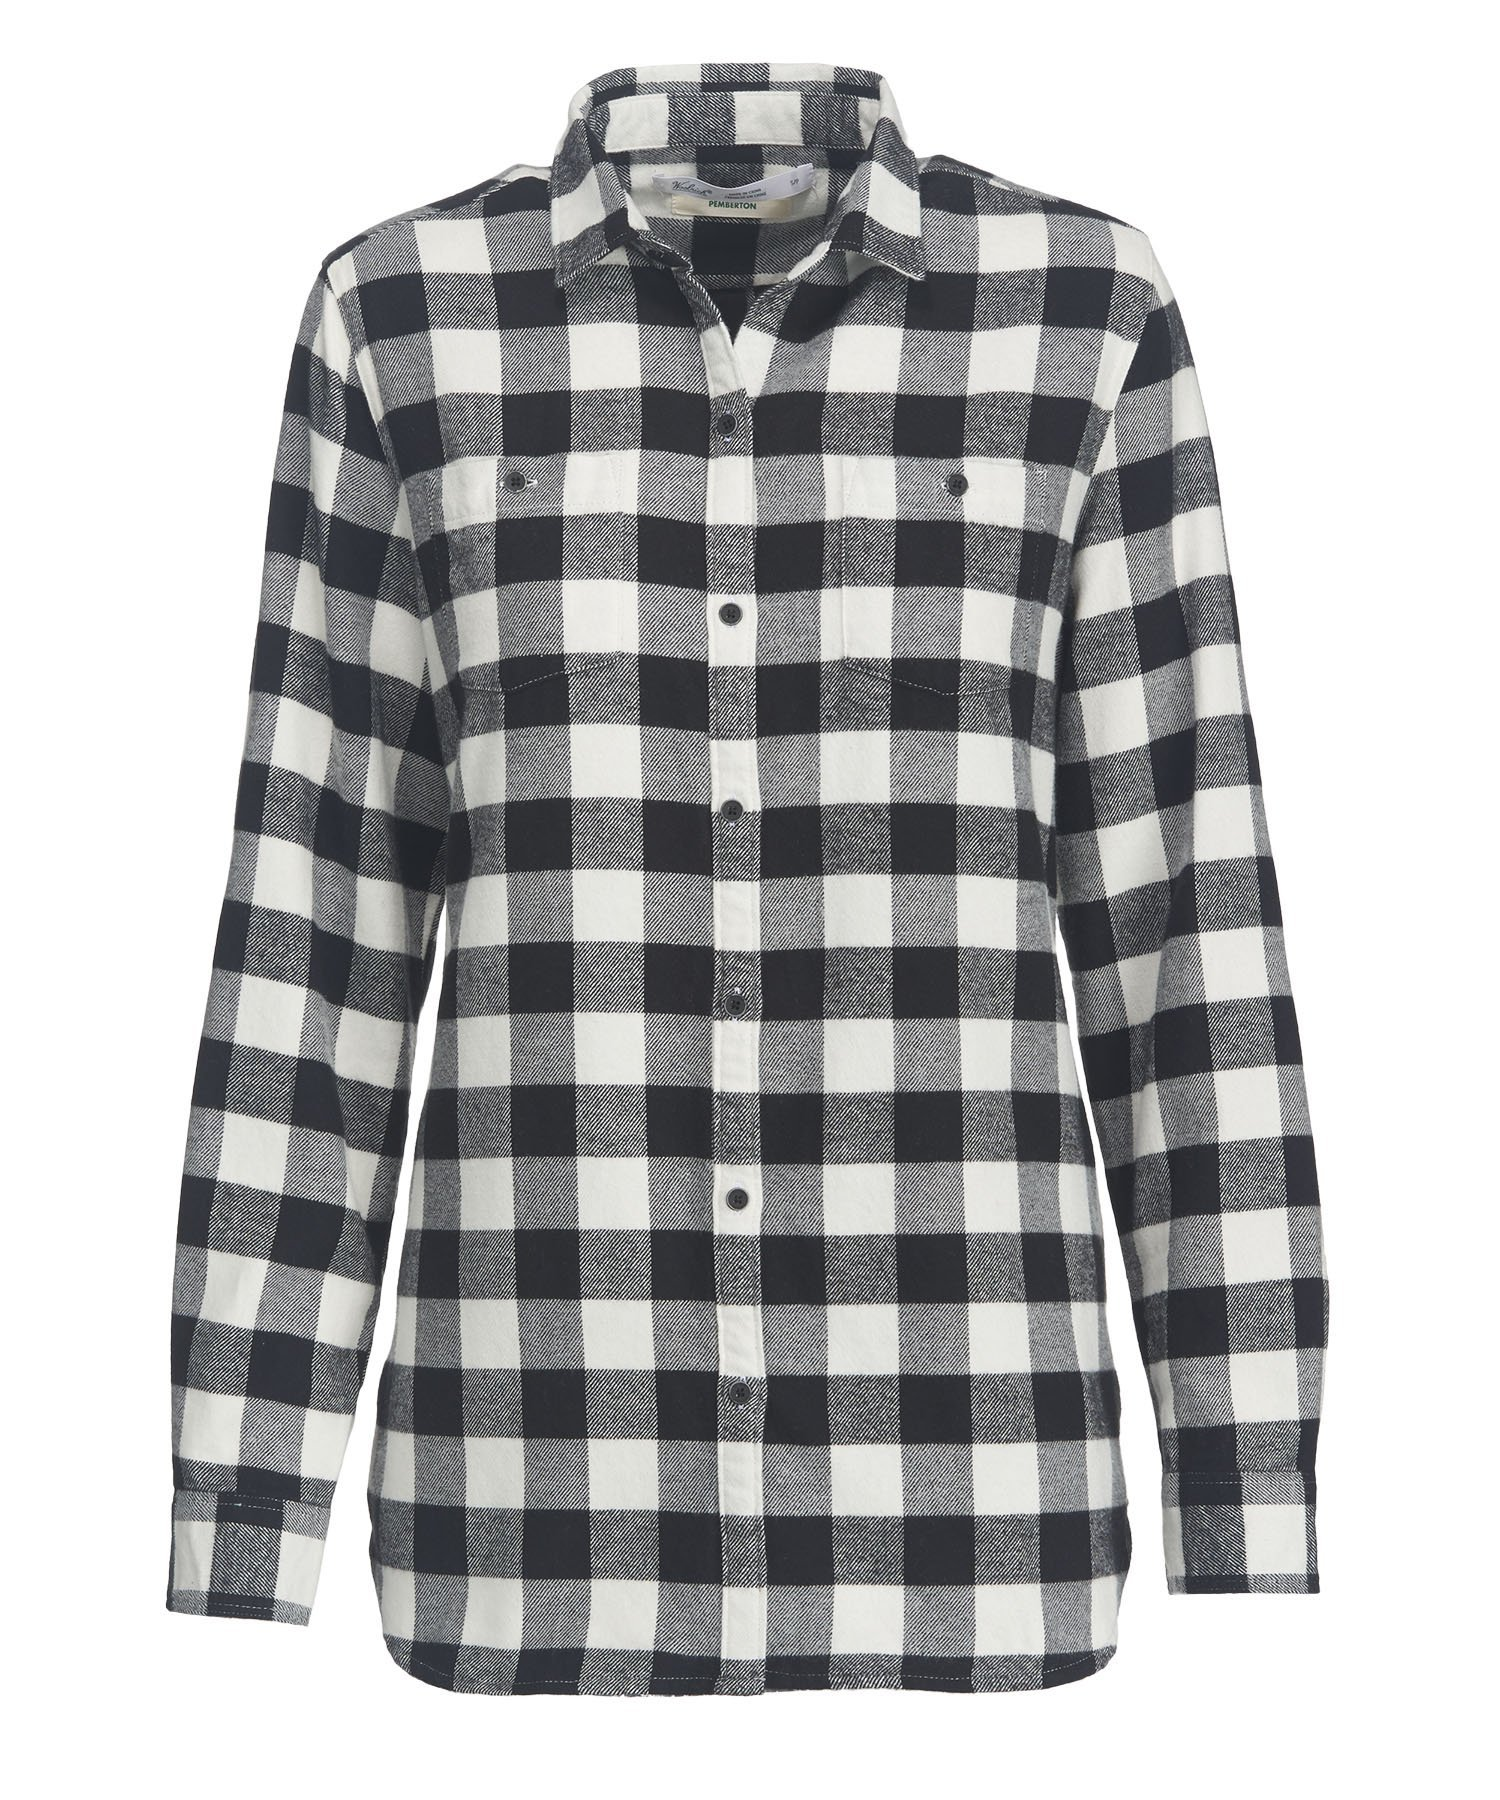 Woolrich Women's Pemberton Boyfriend Flannel Shirt, Ivory Check, M